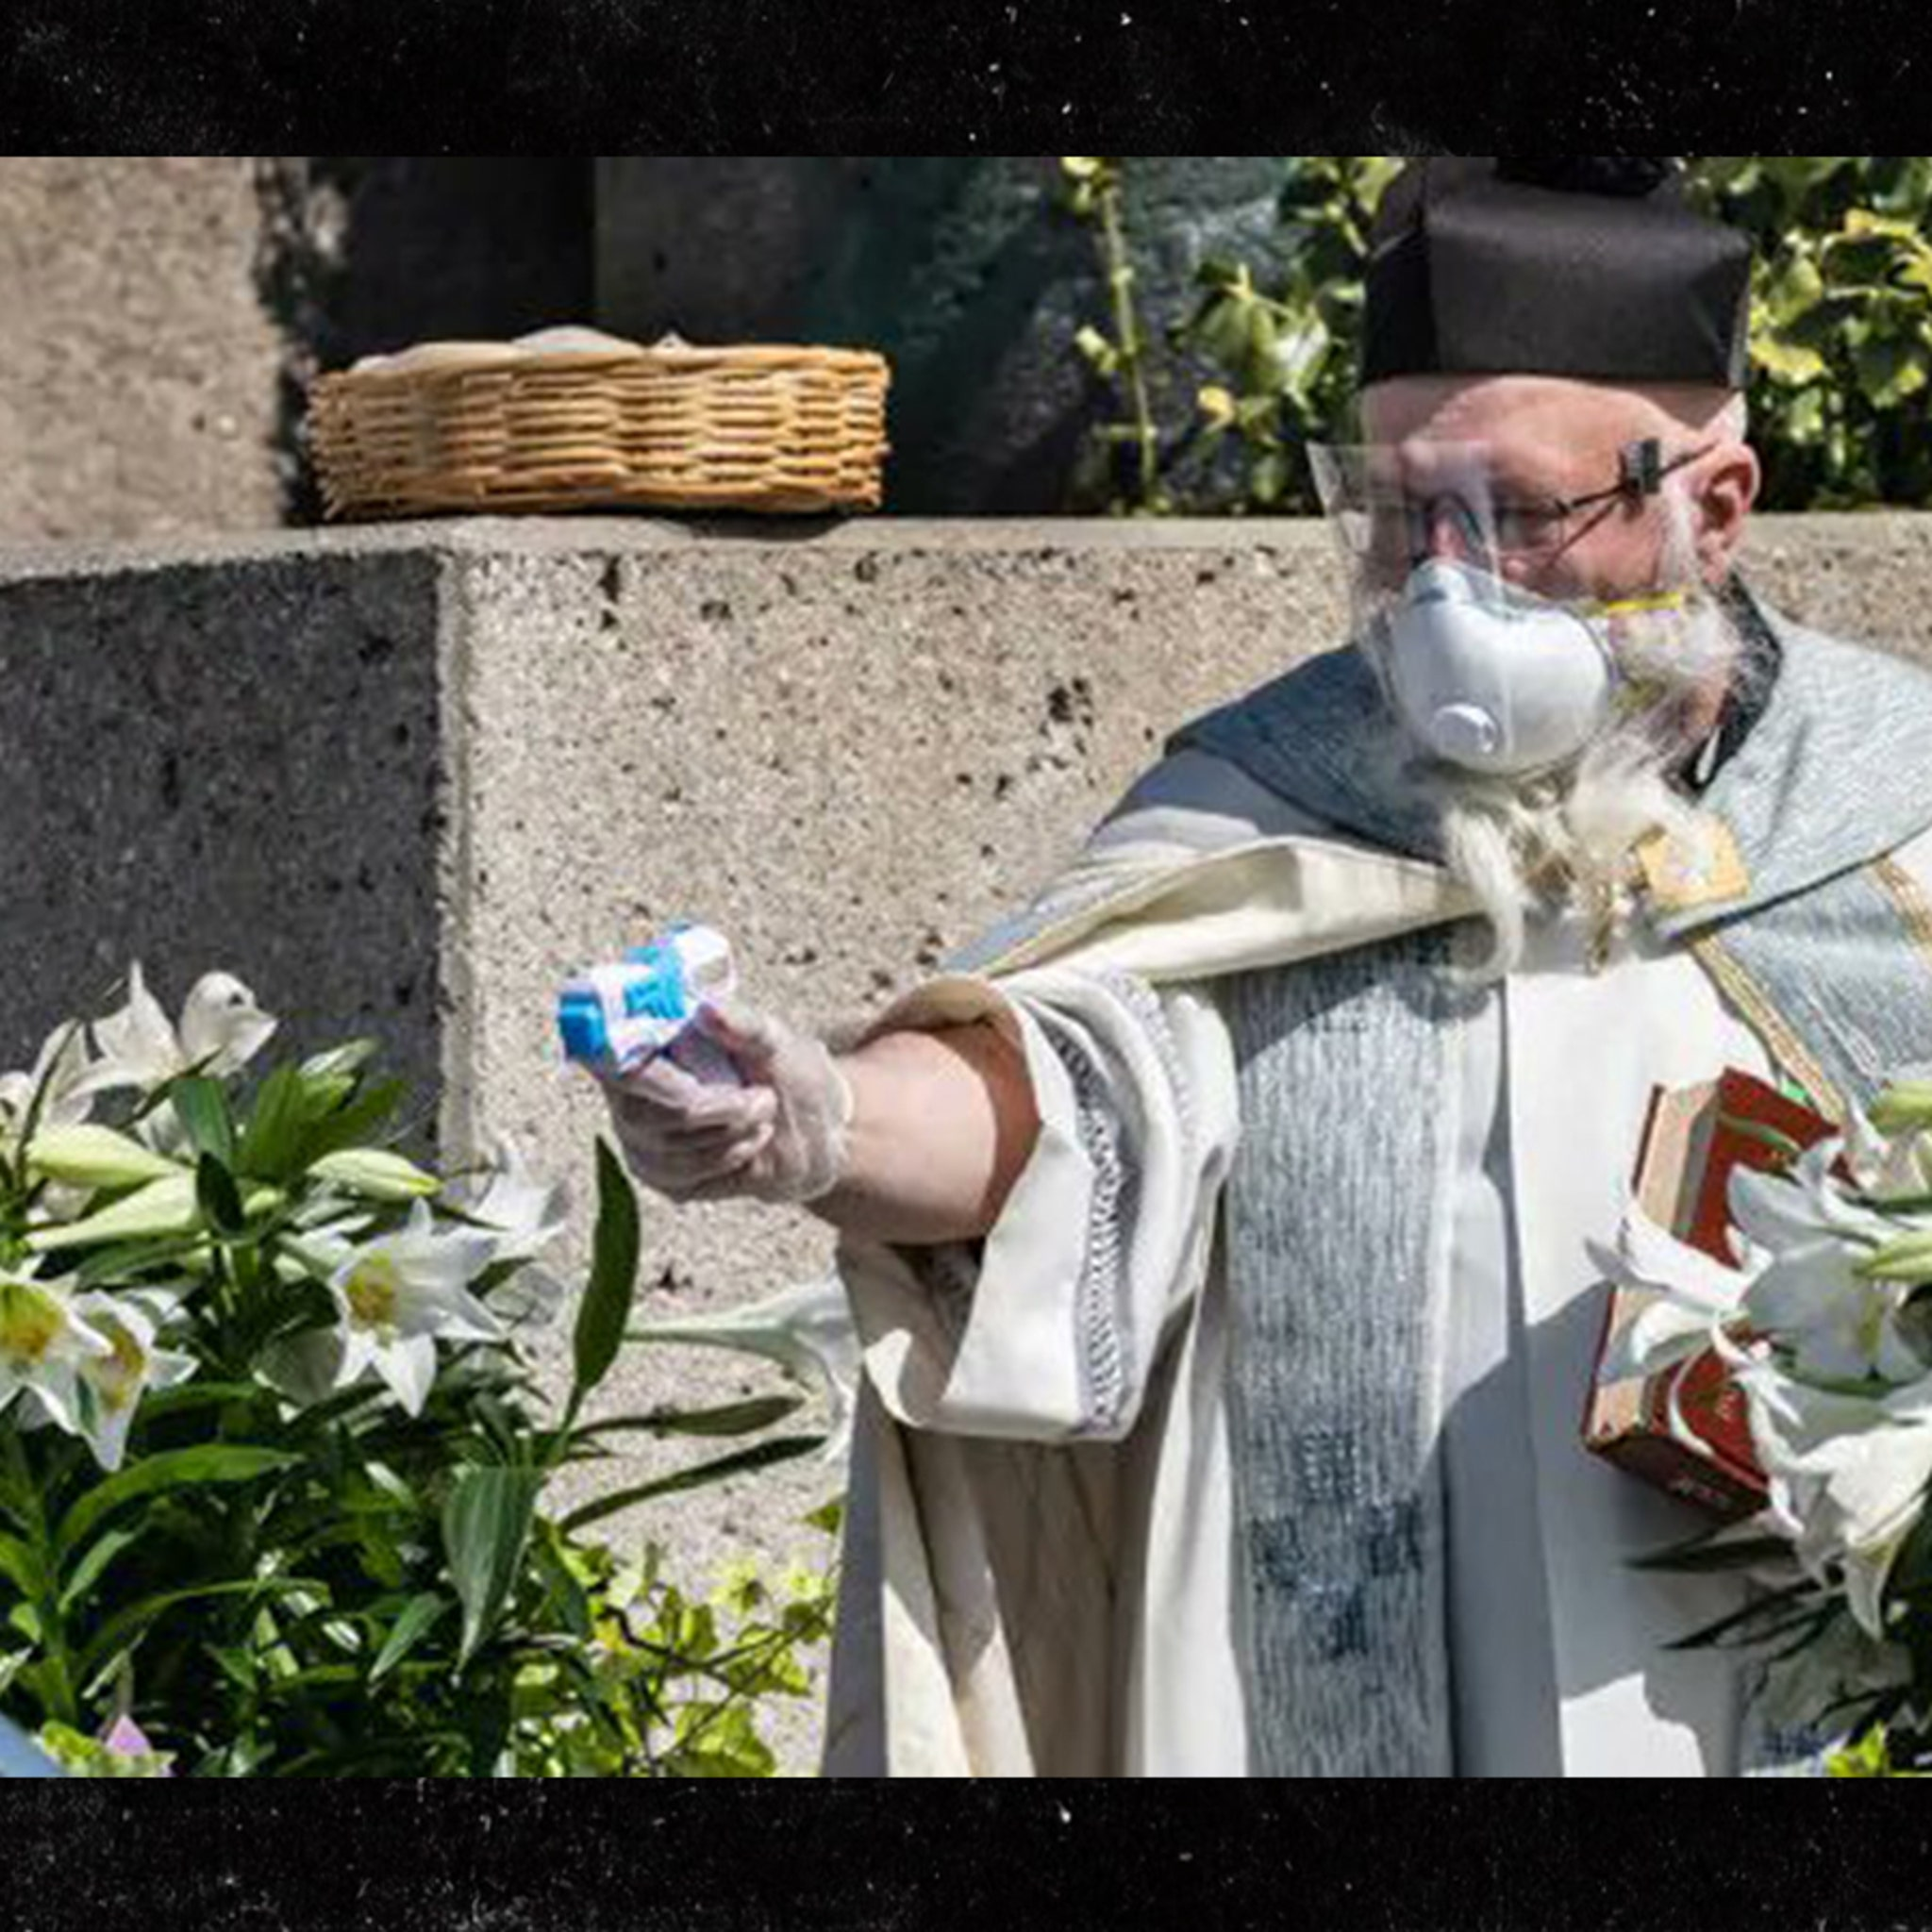 Priest Uses Squirt Gun Drive Thru To Blast Holy Water At Parishioners